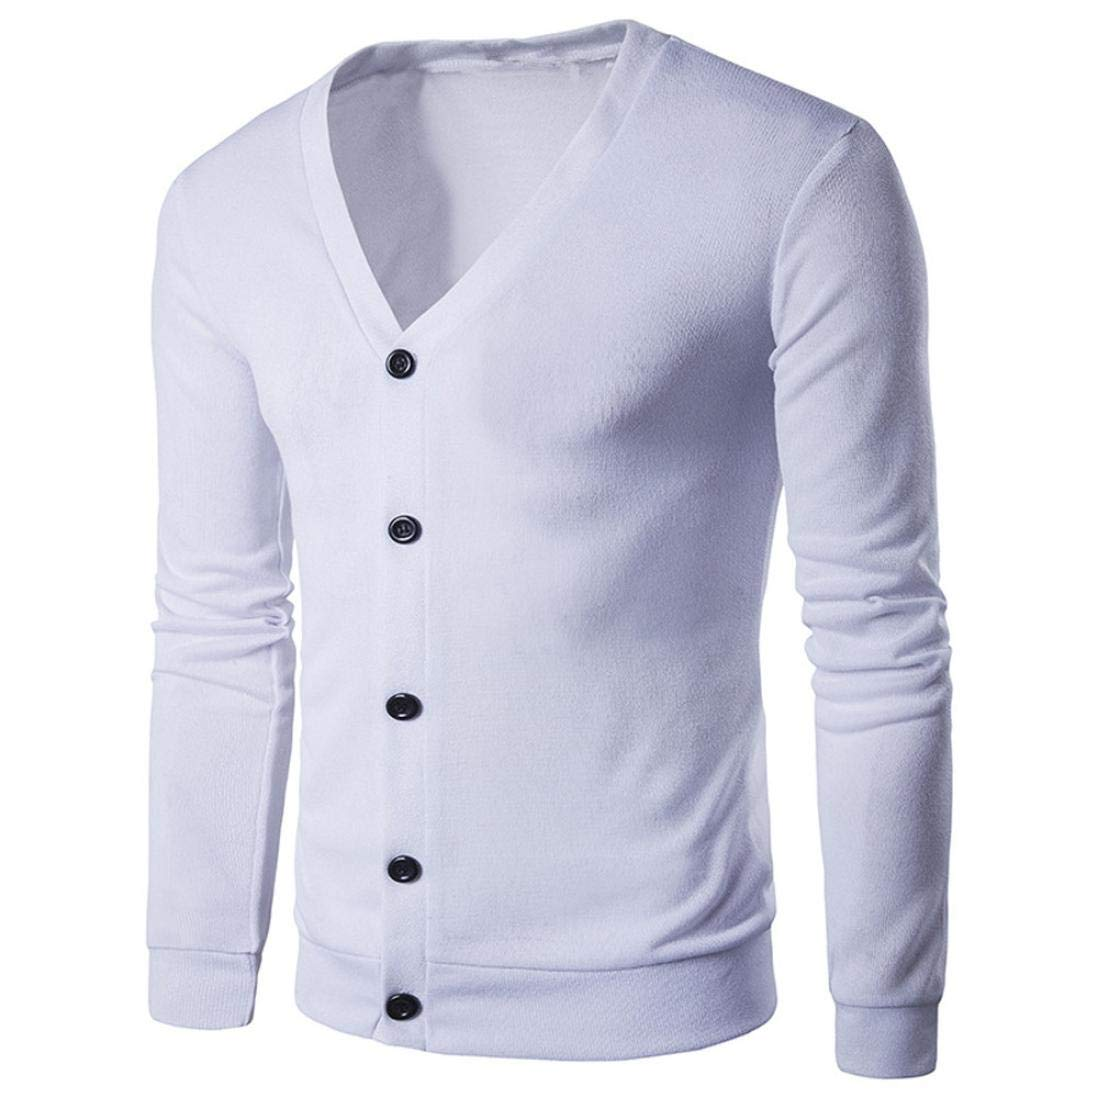 Sharemen V Neck Sweater Men's Button Point Knitted Slim Fit Cardigan 4669